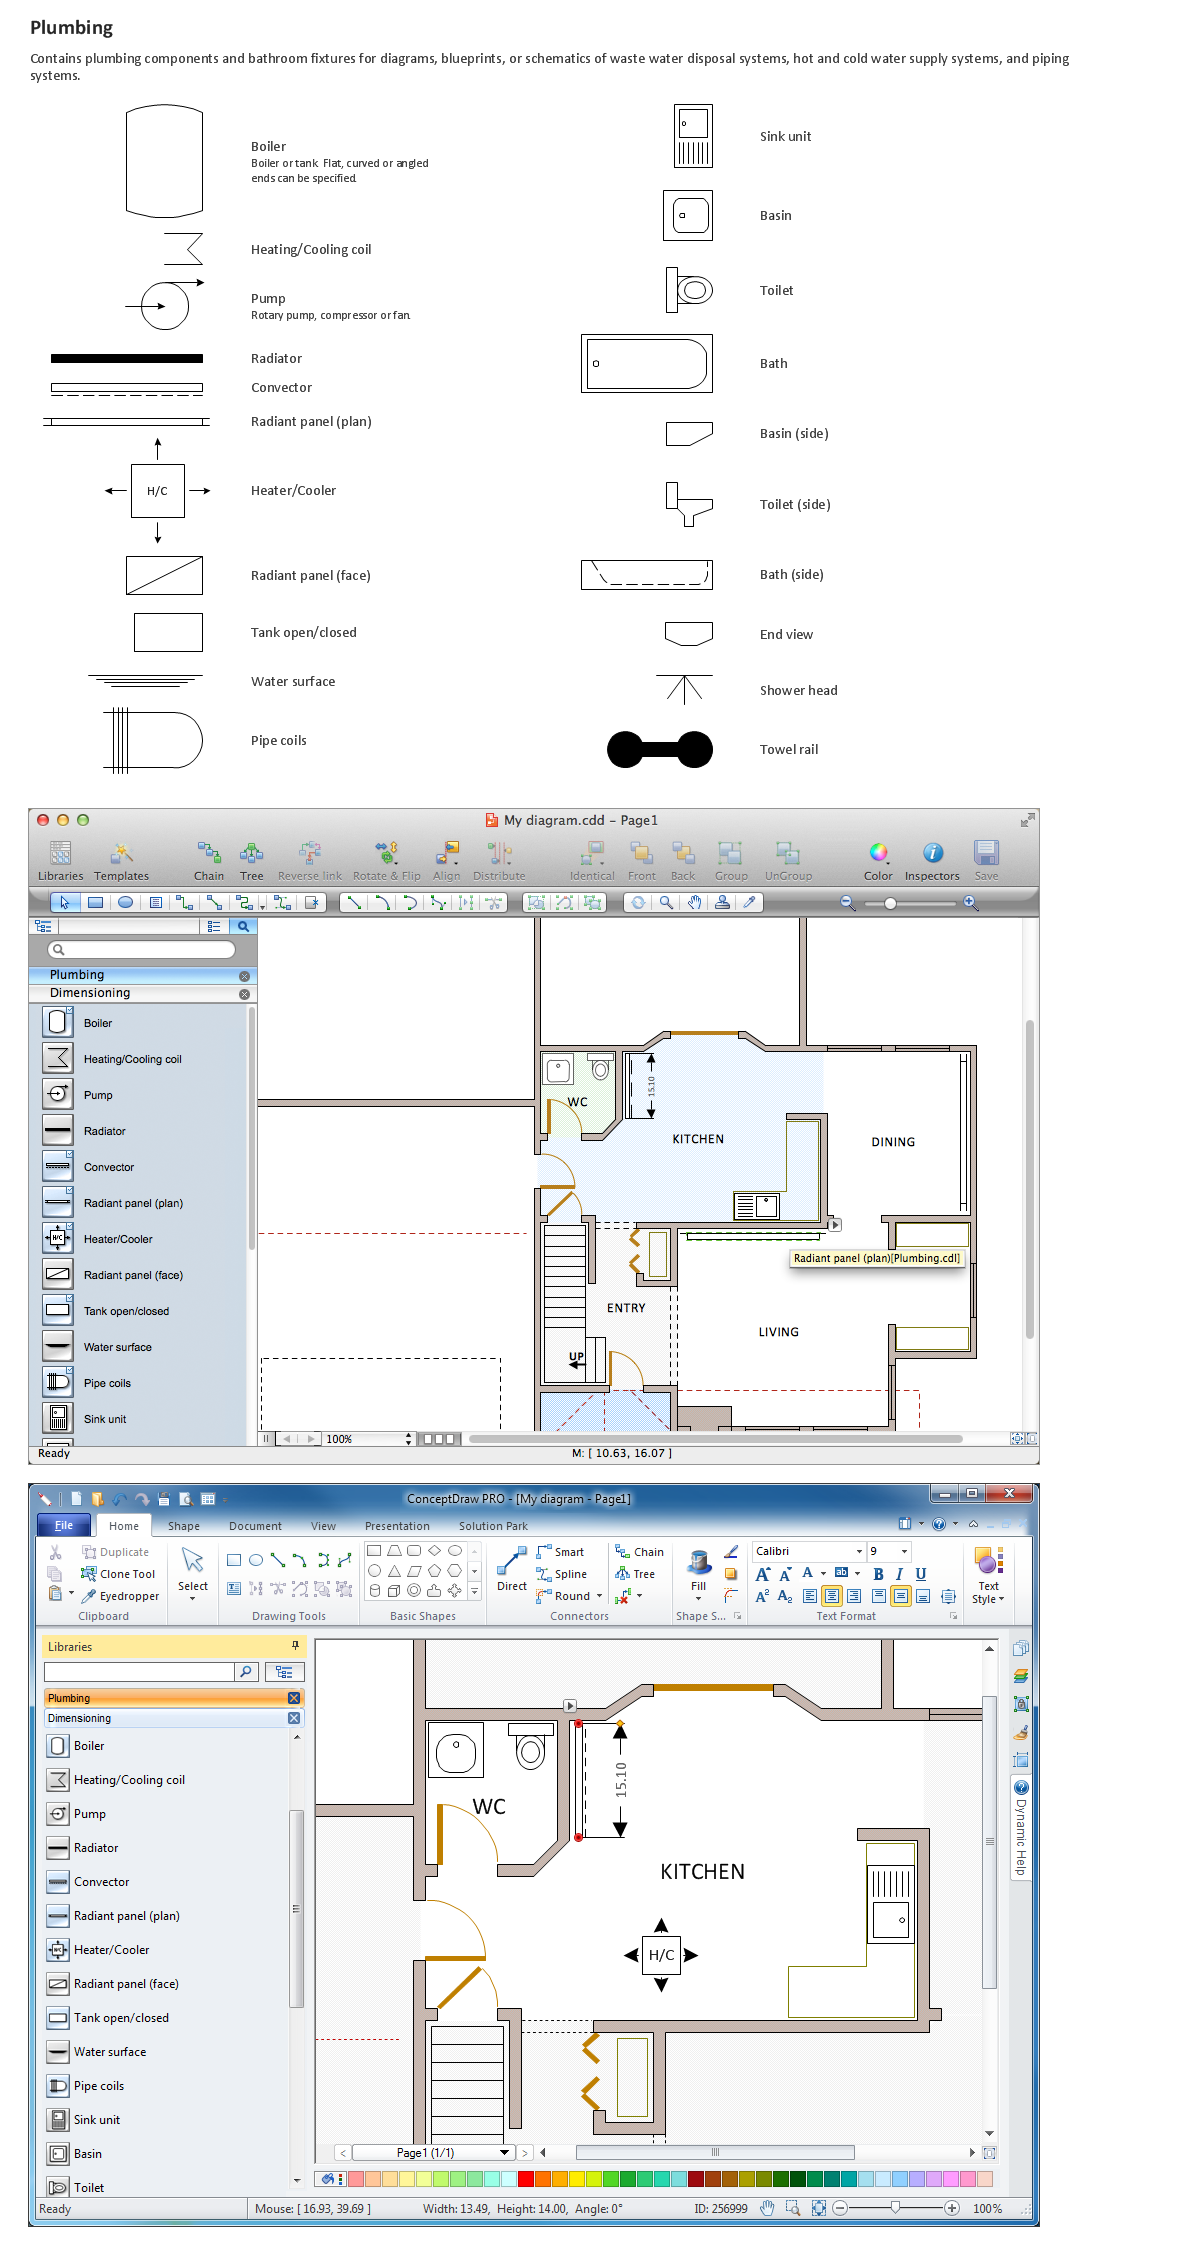 medium resolution of building drawing tools design elements plumbing lake living electrical plan program building drawing tools design elements